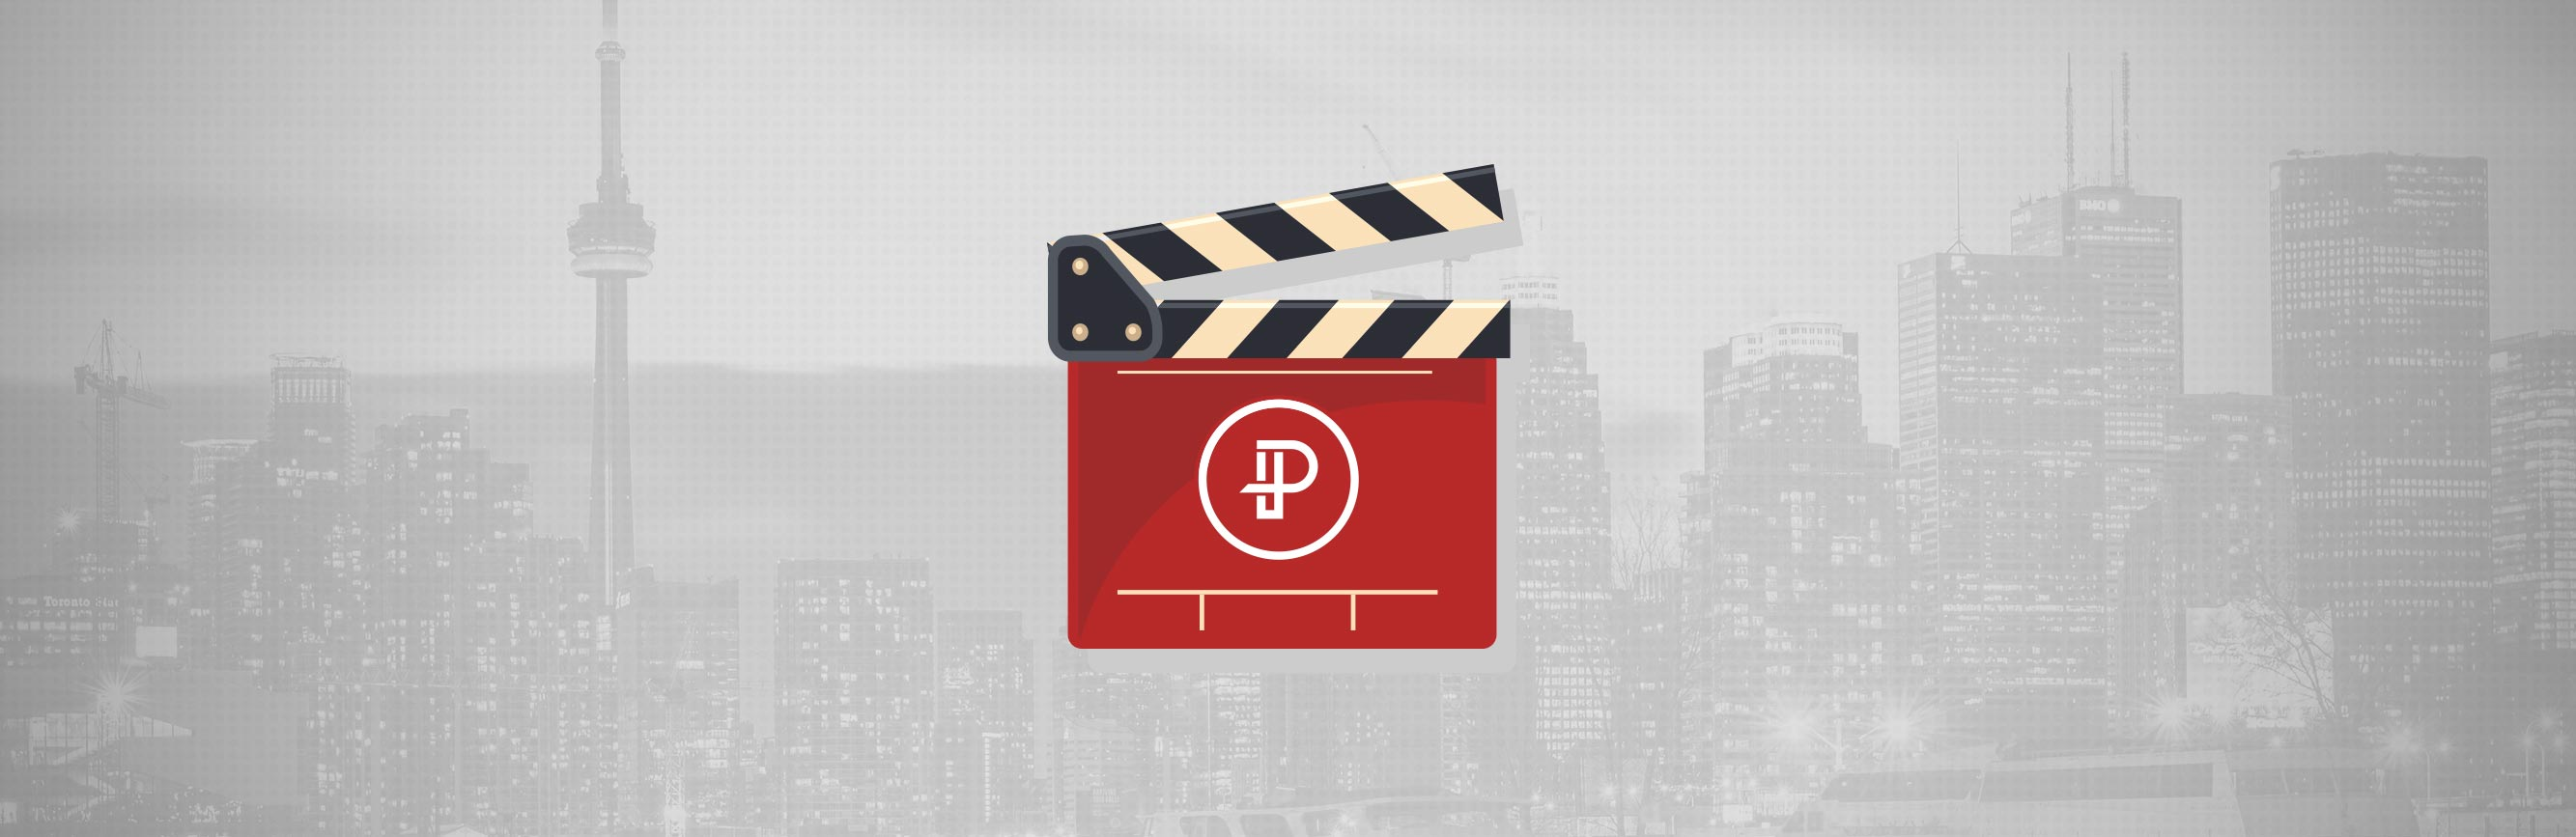 pol videos